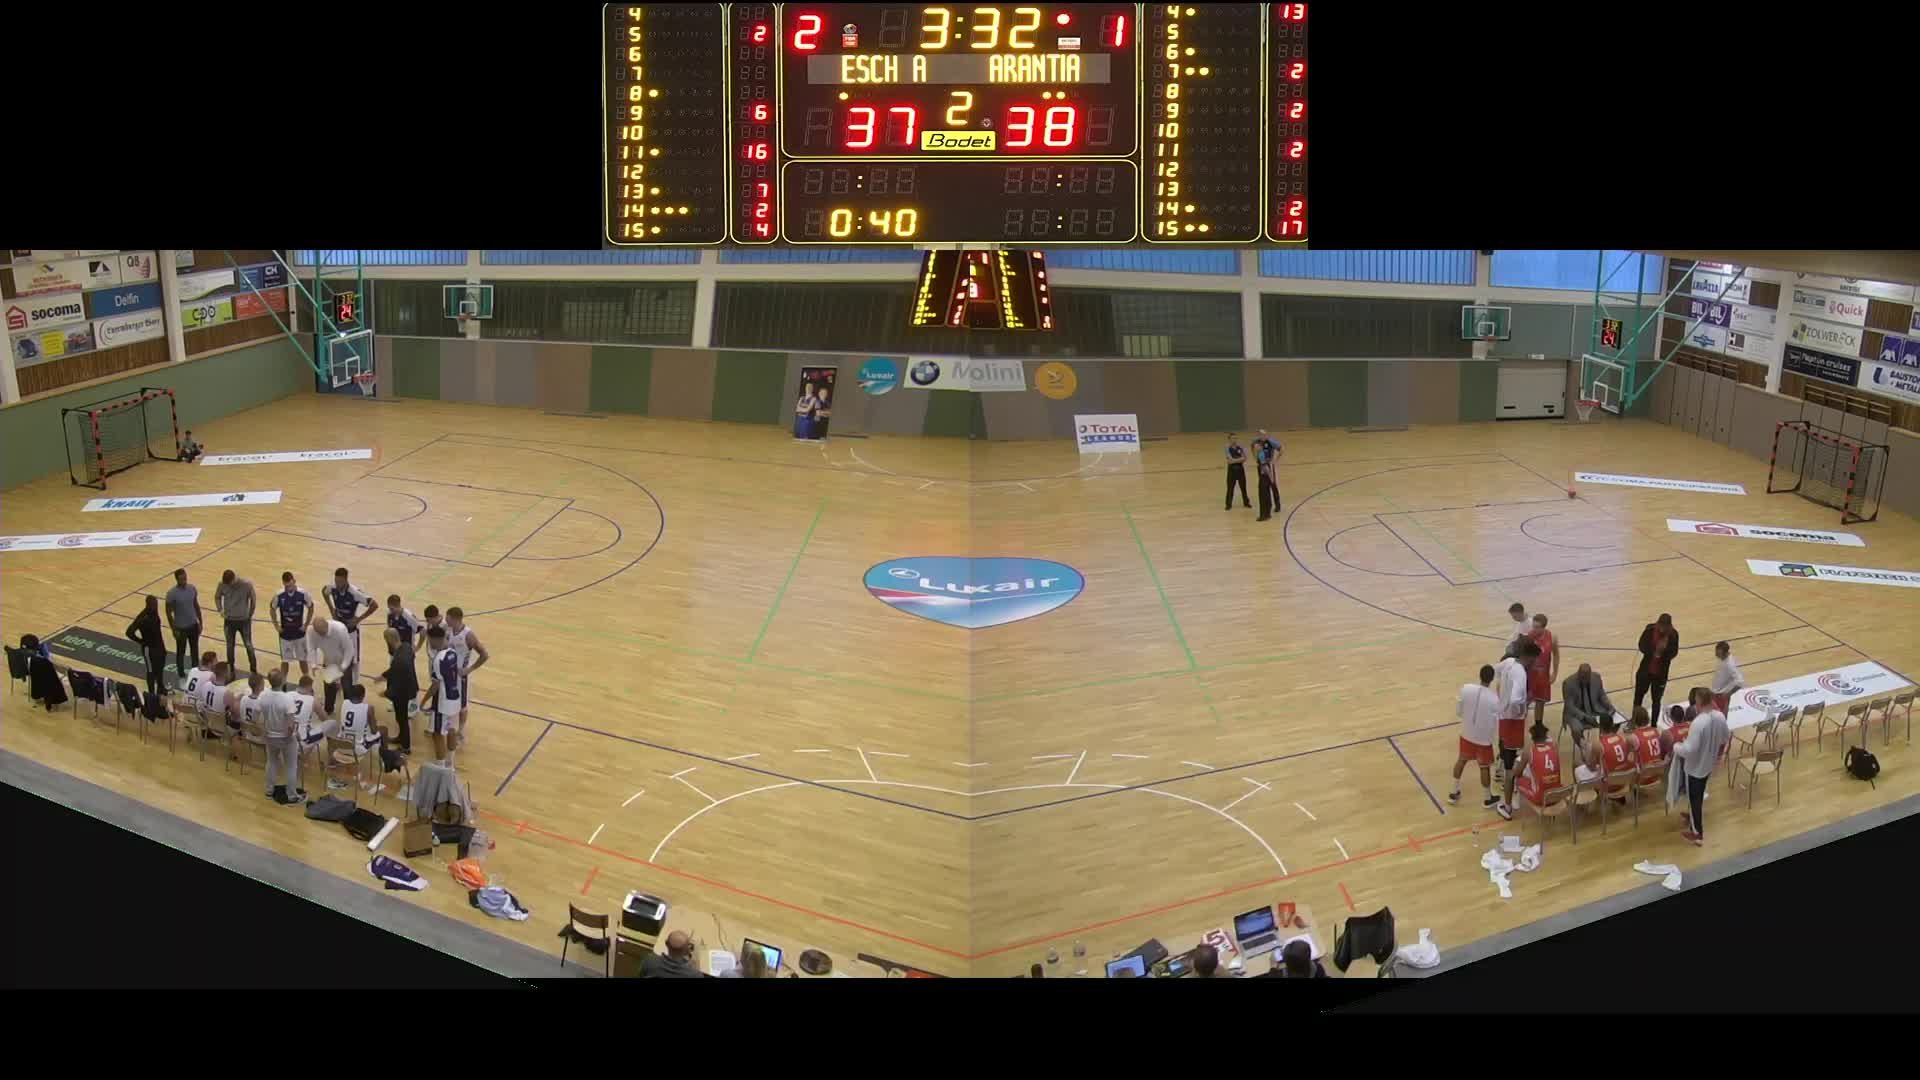 Basket Esch (Seniors A) - Arantia - 06.10.2019